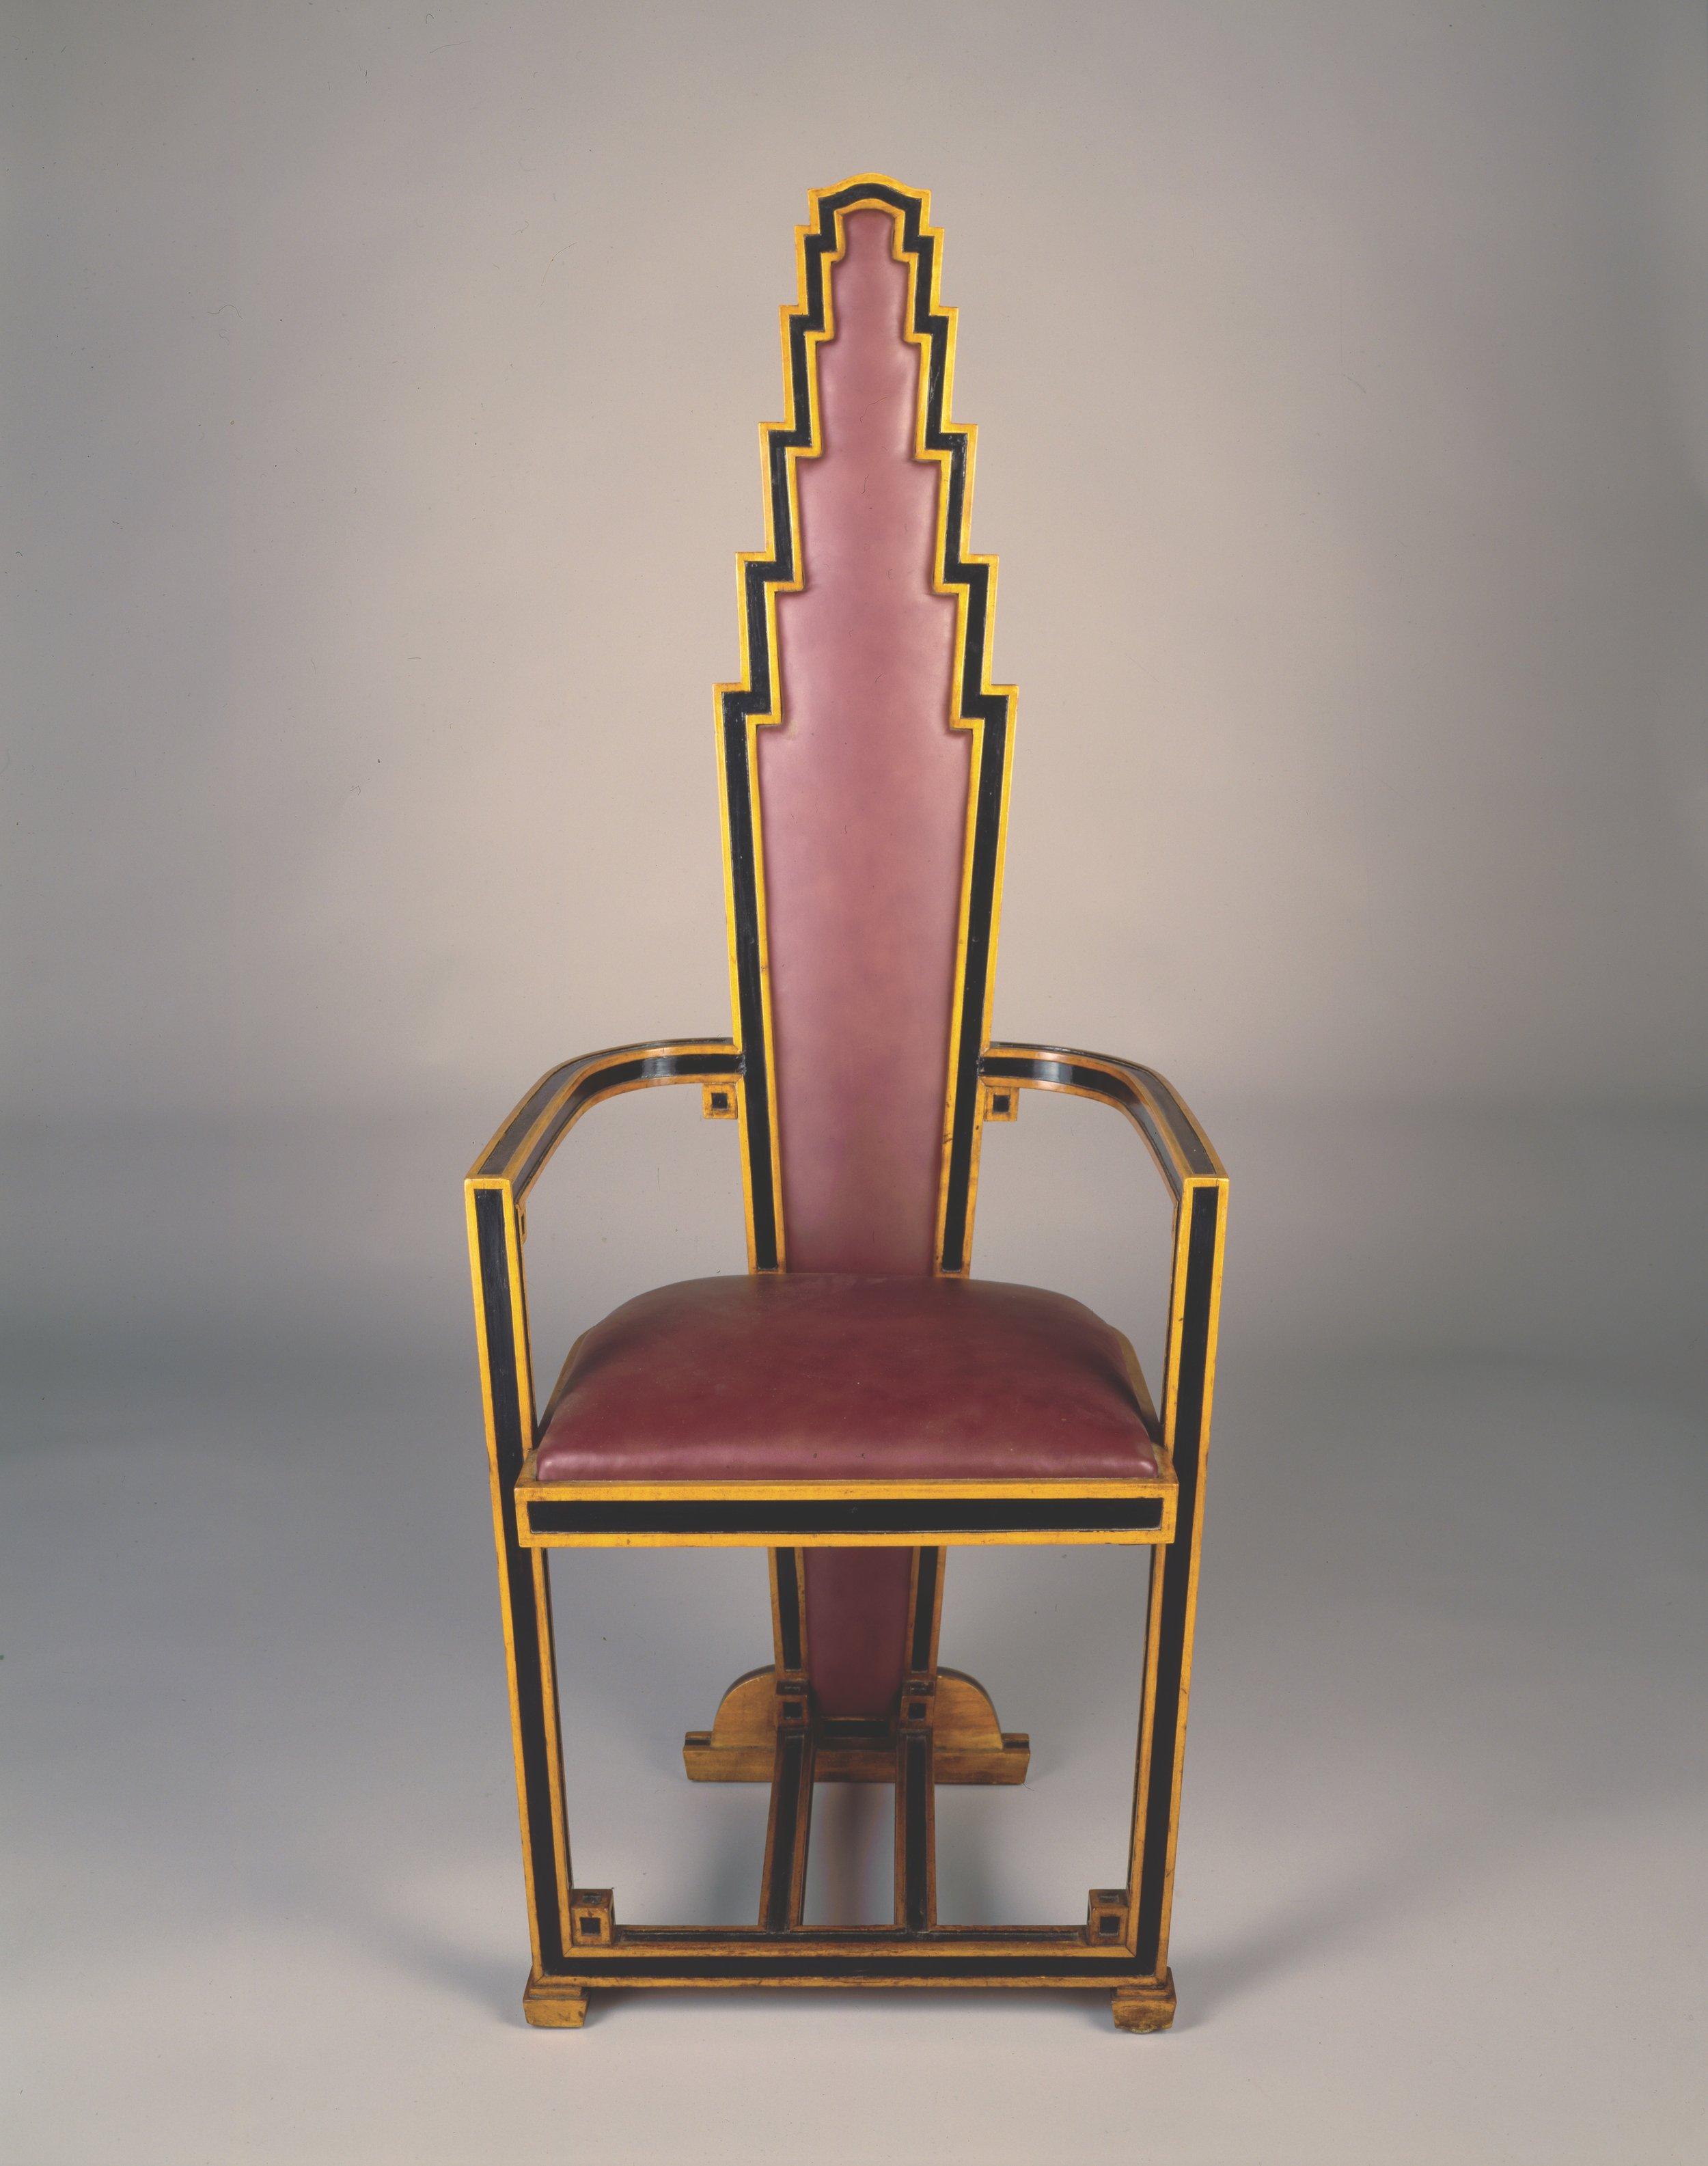 Faidy_Skyscraper_Arm_Chair_i031945.jpg